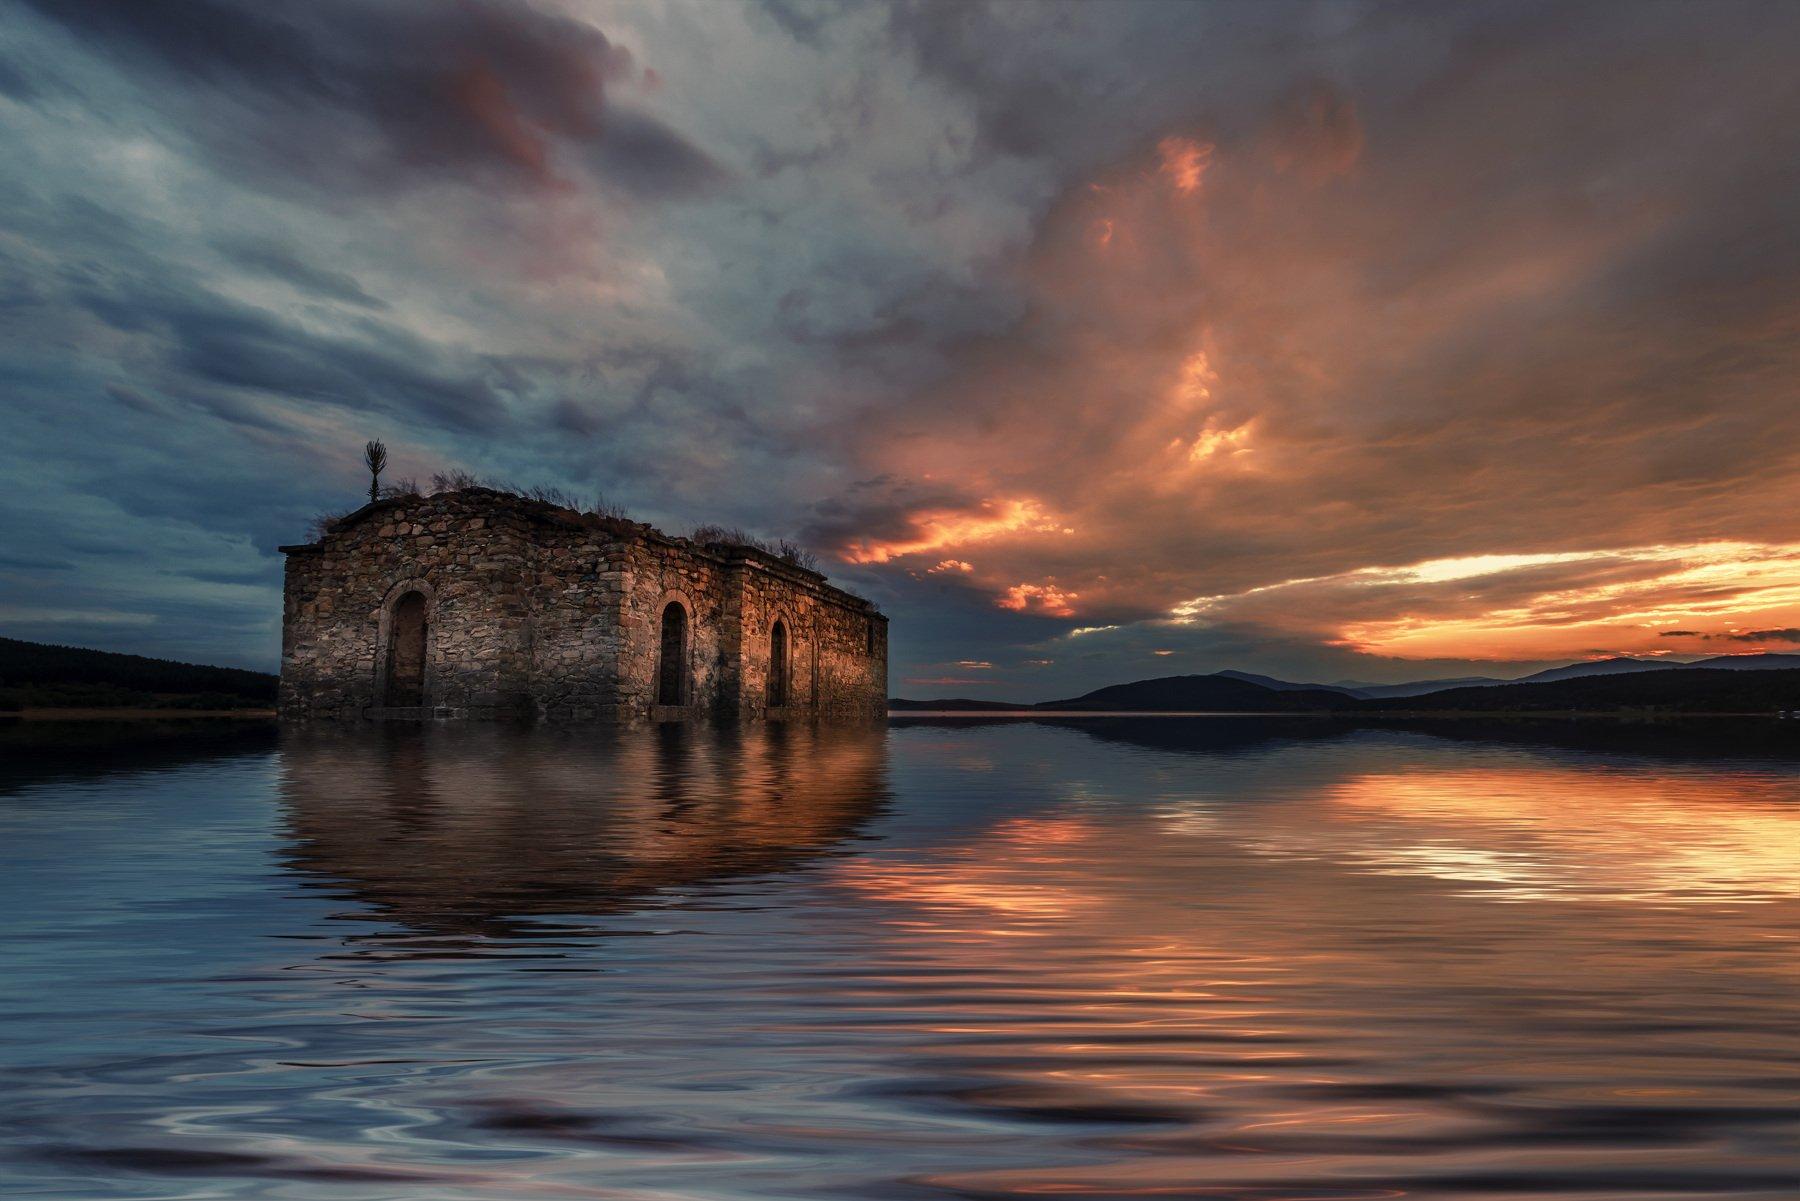 sunset, dam, water, landscape, church, clouds, sky, golden, Jeni Madjarova